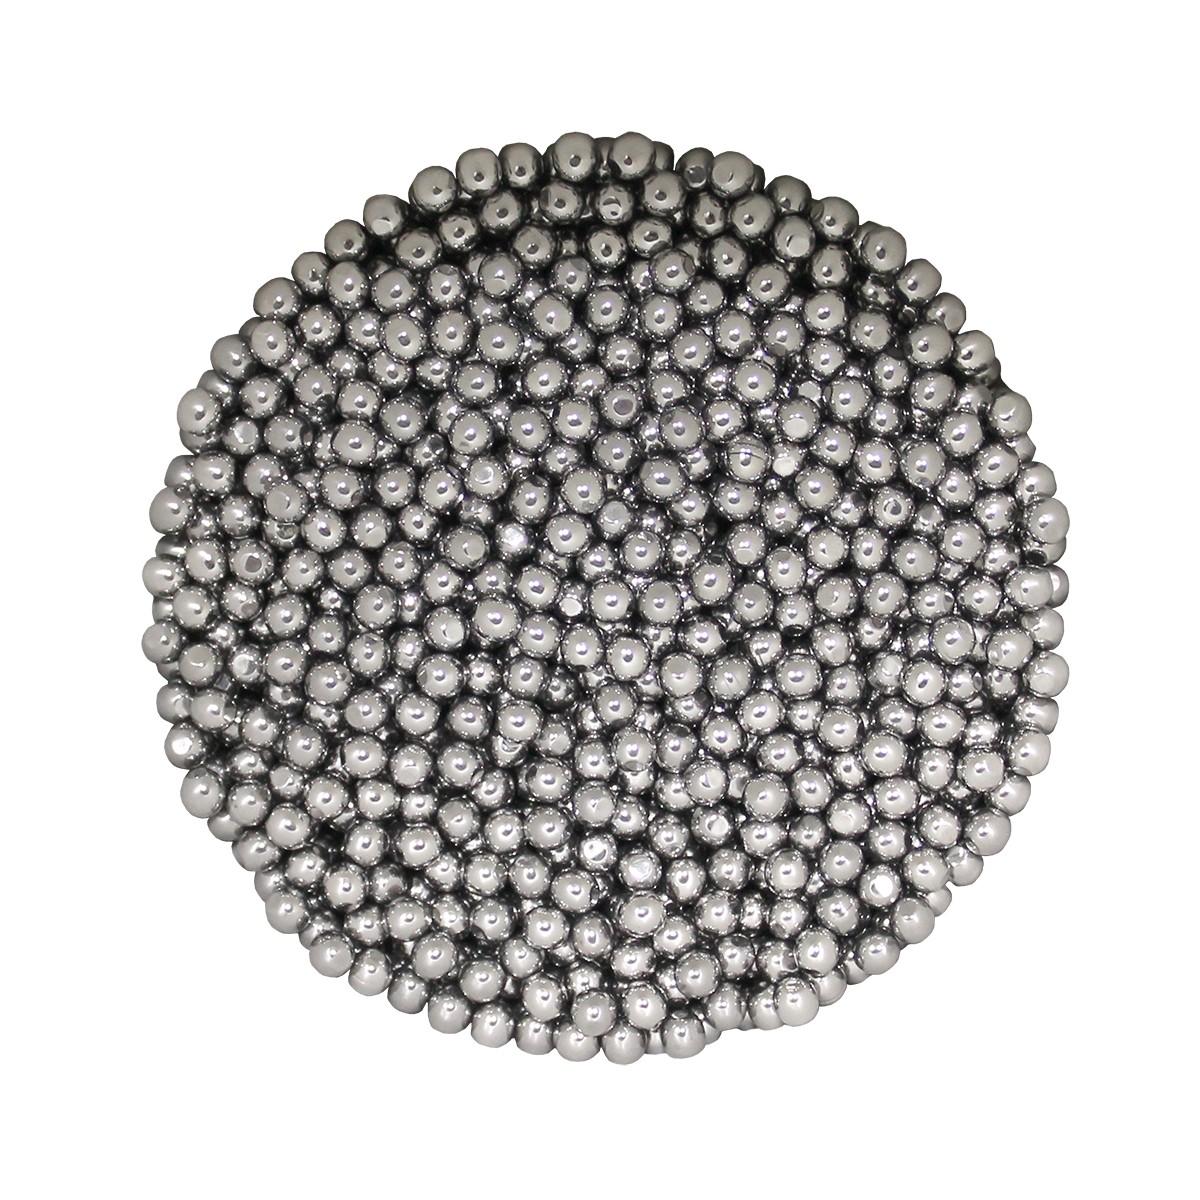 "Carbon Steel Shot Media - Sphere / 1/8"" (3.18mm)"